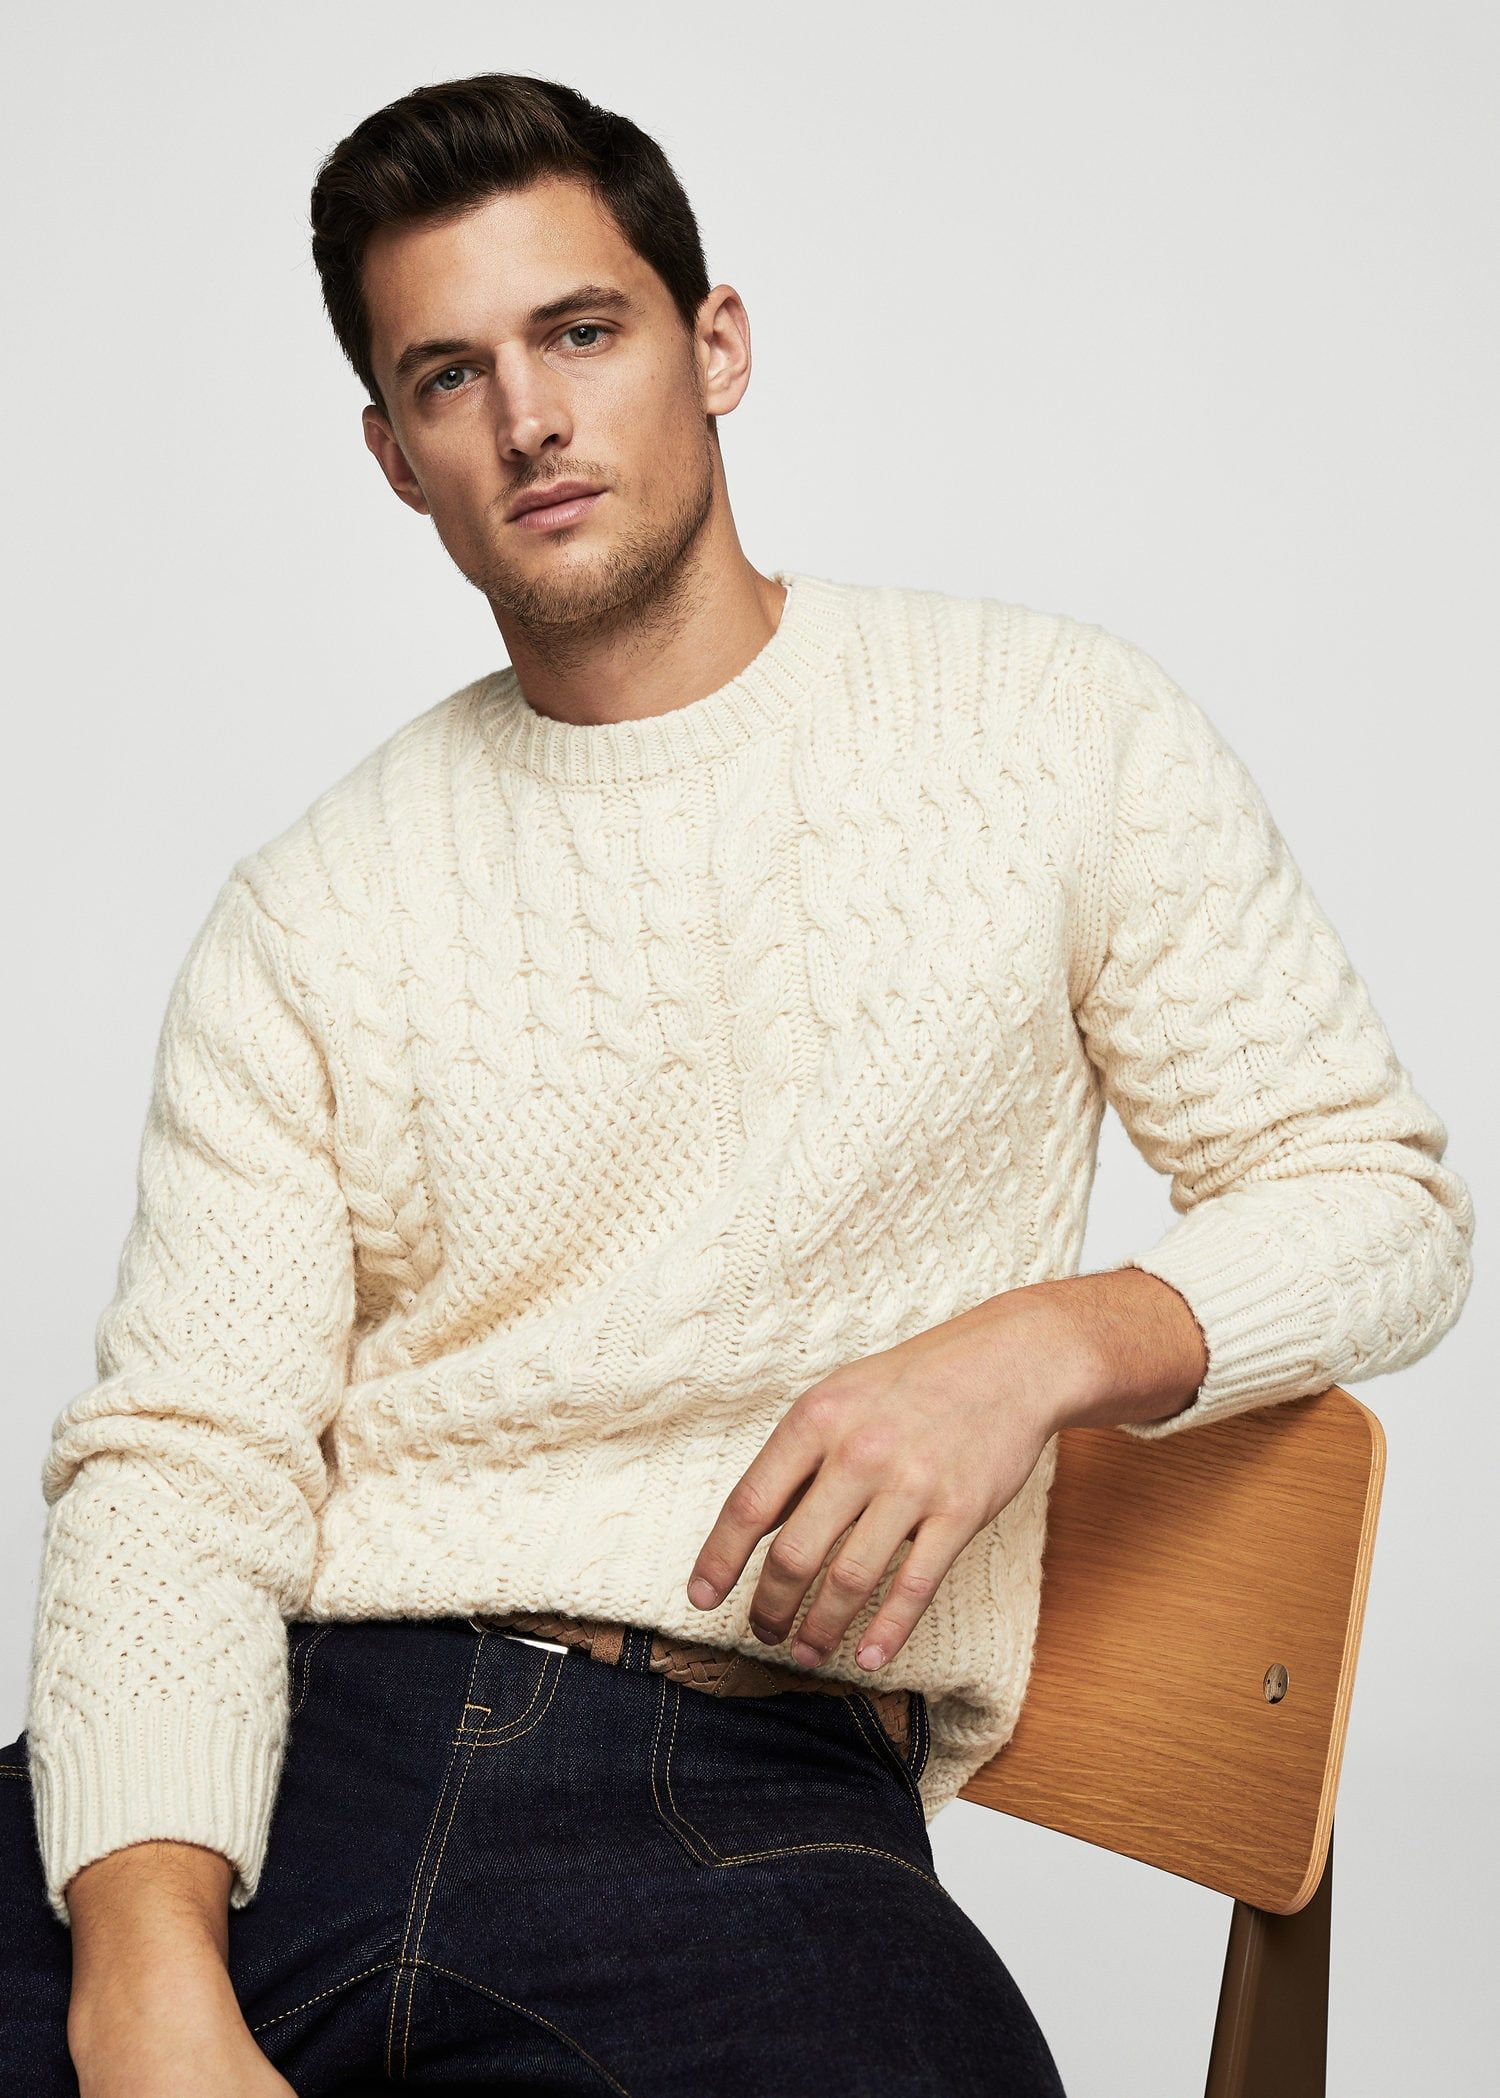 Jersey lana ochos - Hombre | Tricot | Pinterest | Lana, Hombres y ...